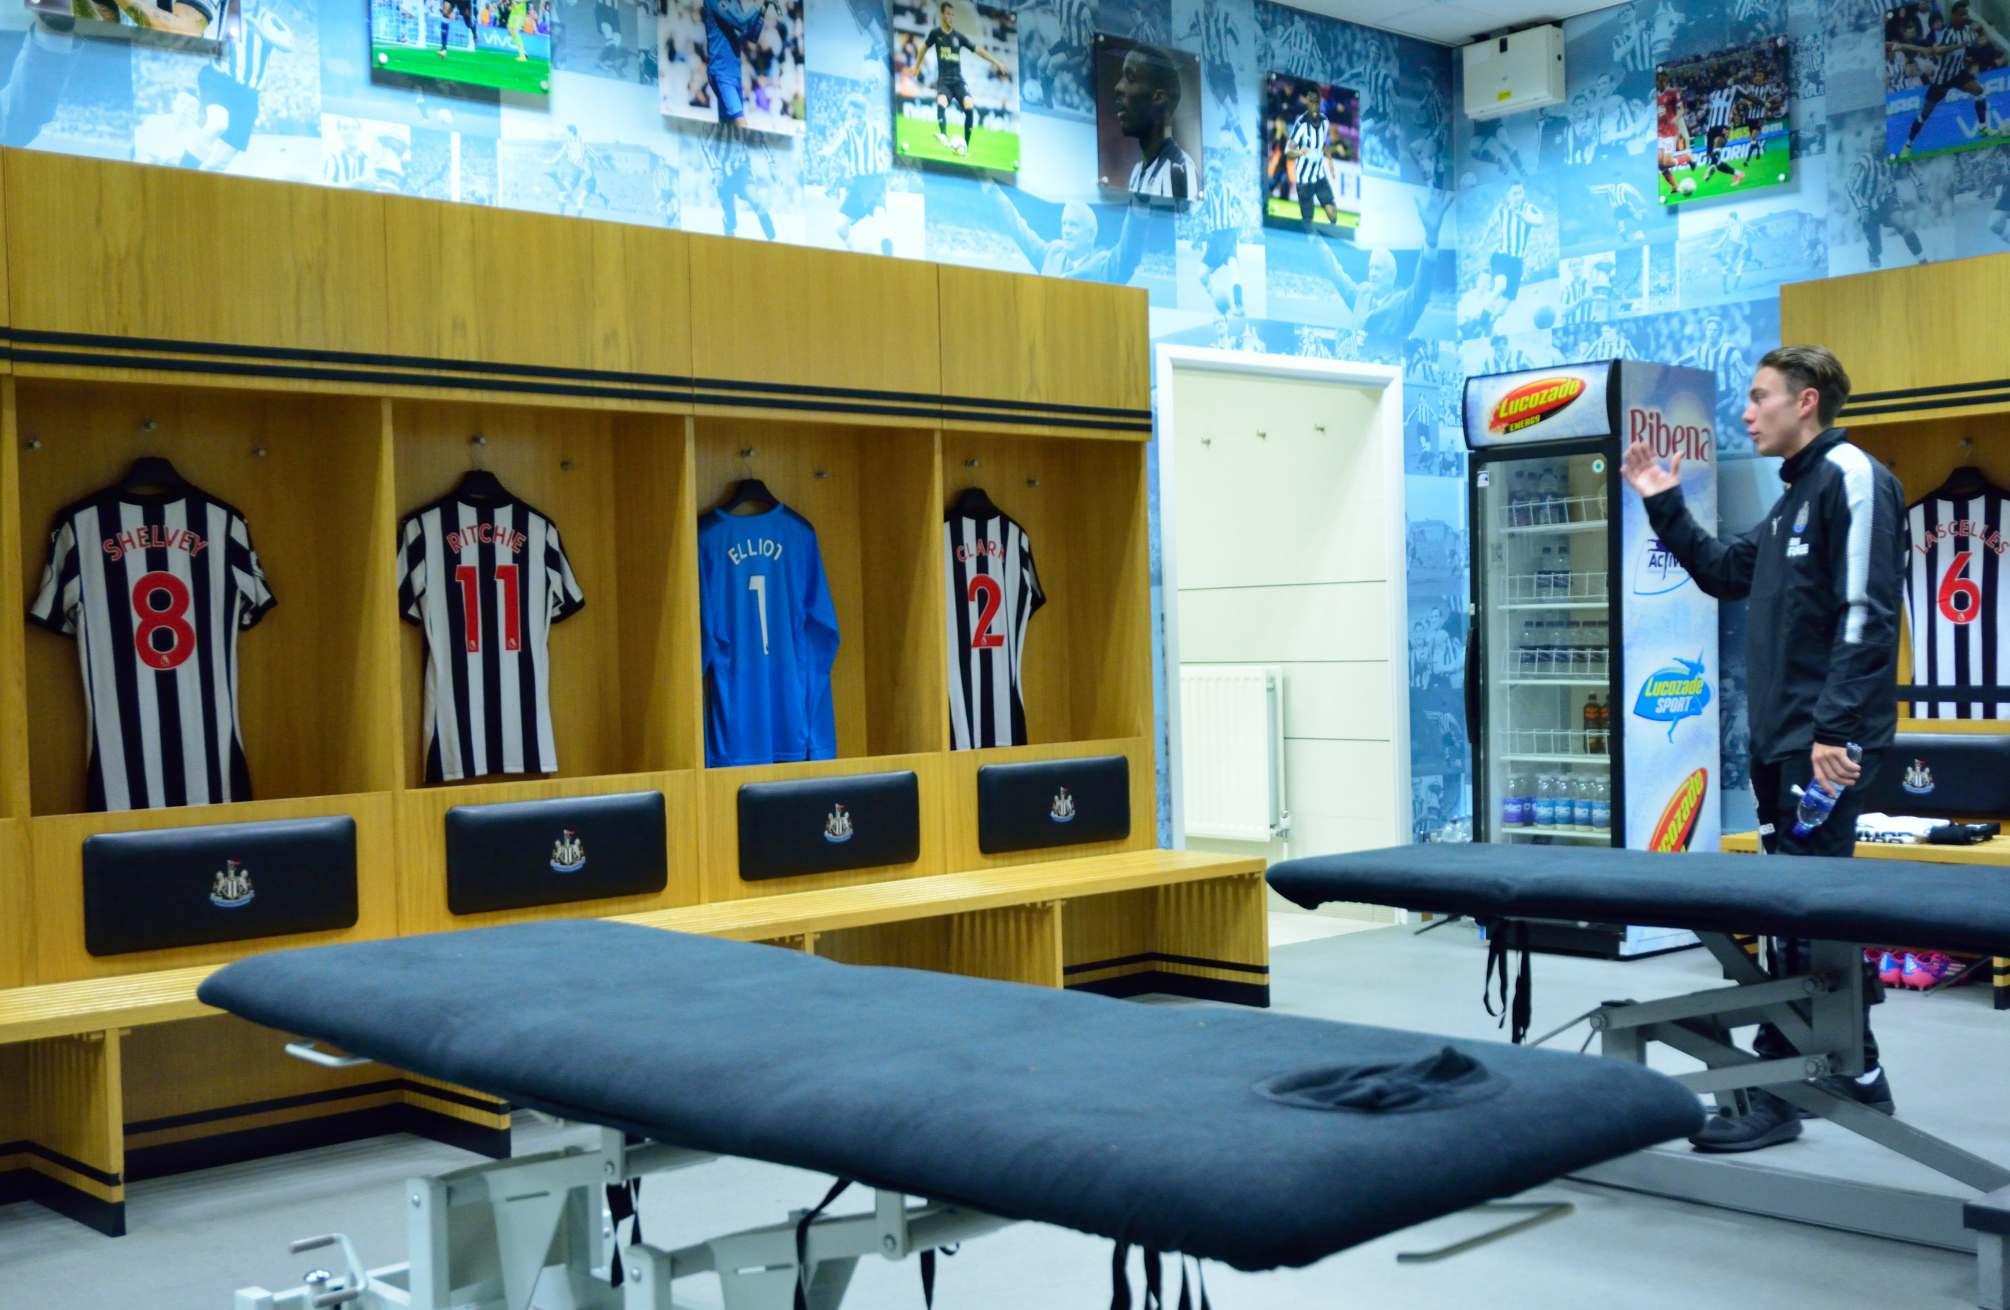 nufc tours10 Newcastle United Stadium Tours for Fans